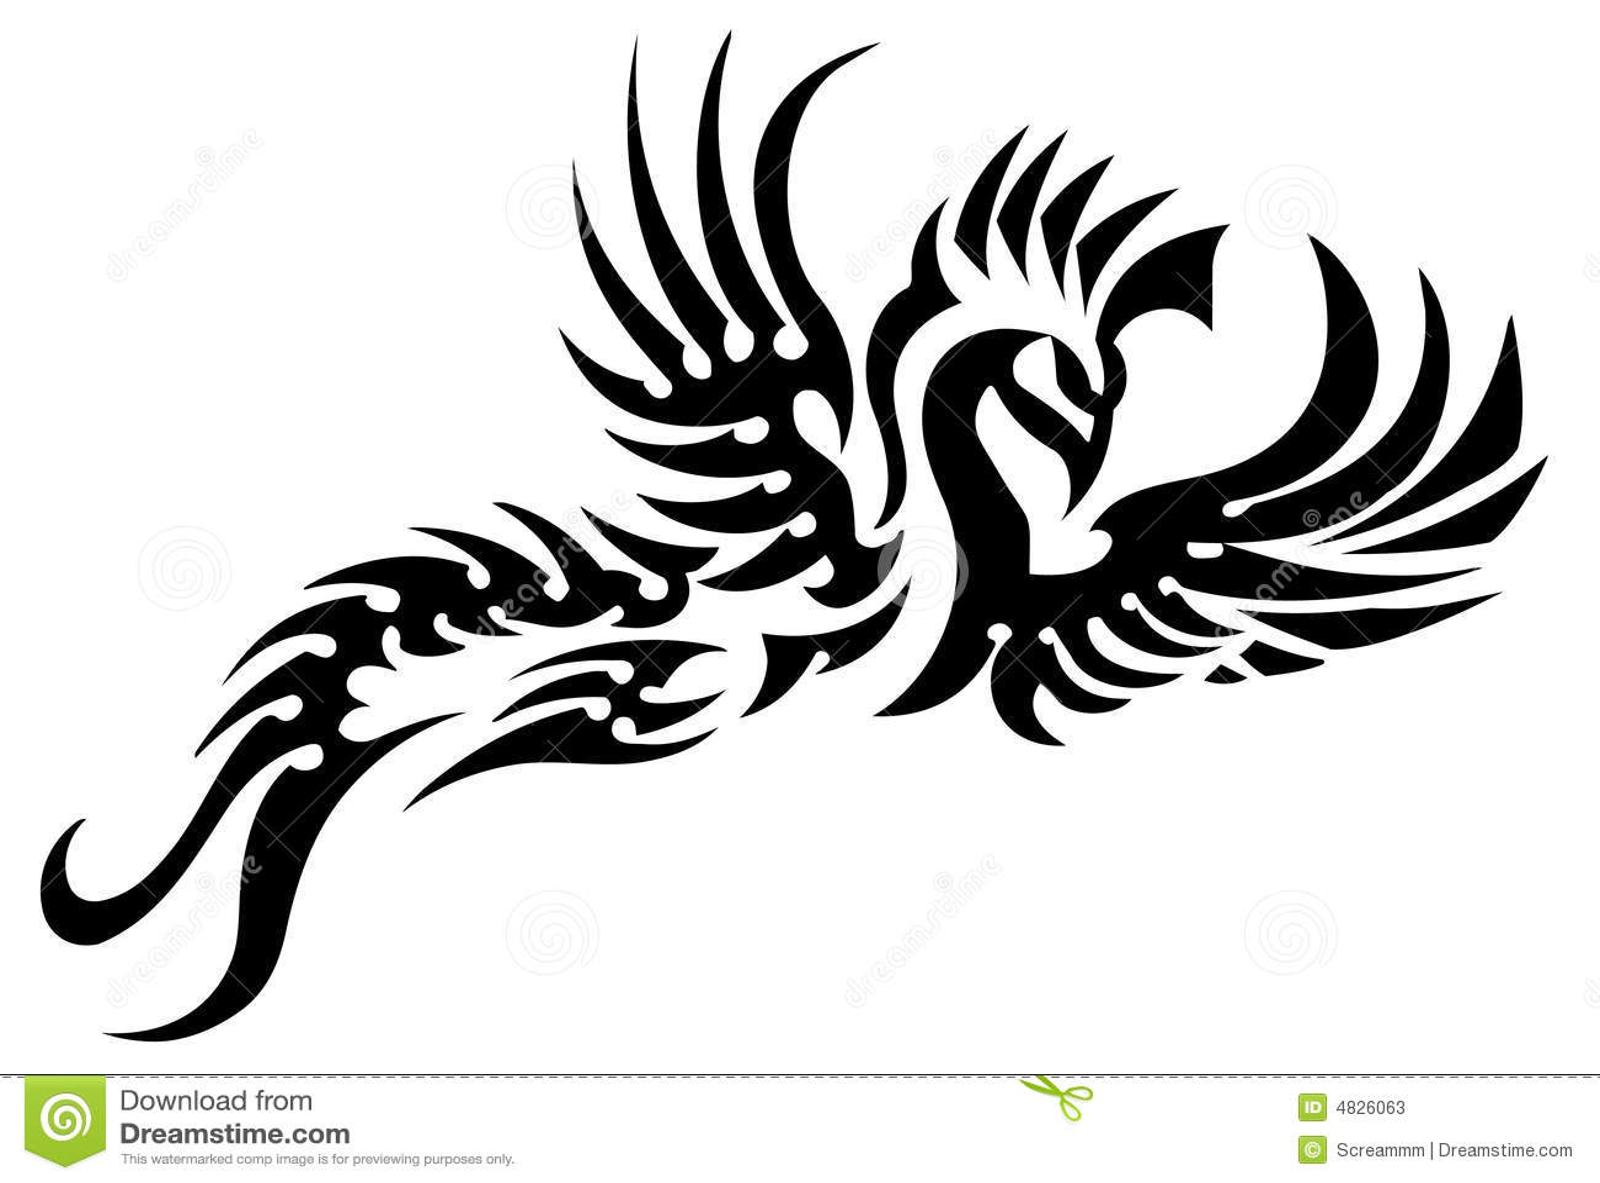 tatouage tribal d 39 oiseau illustration de vecteur illustration du dessin 4826063. Black Bedroom Furniture Sets. Home Design Ideas